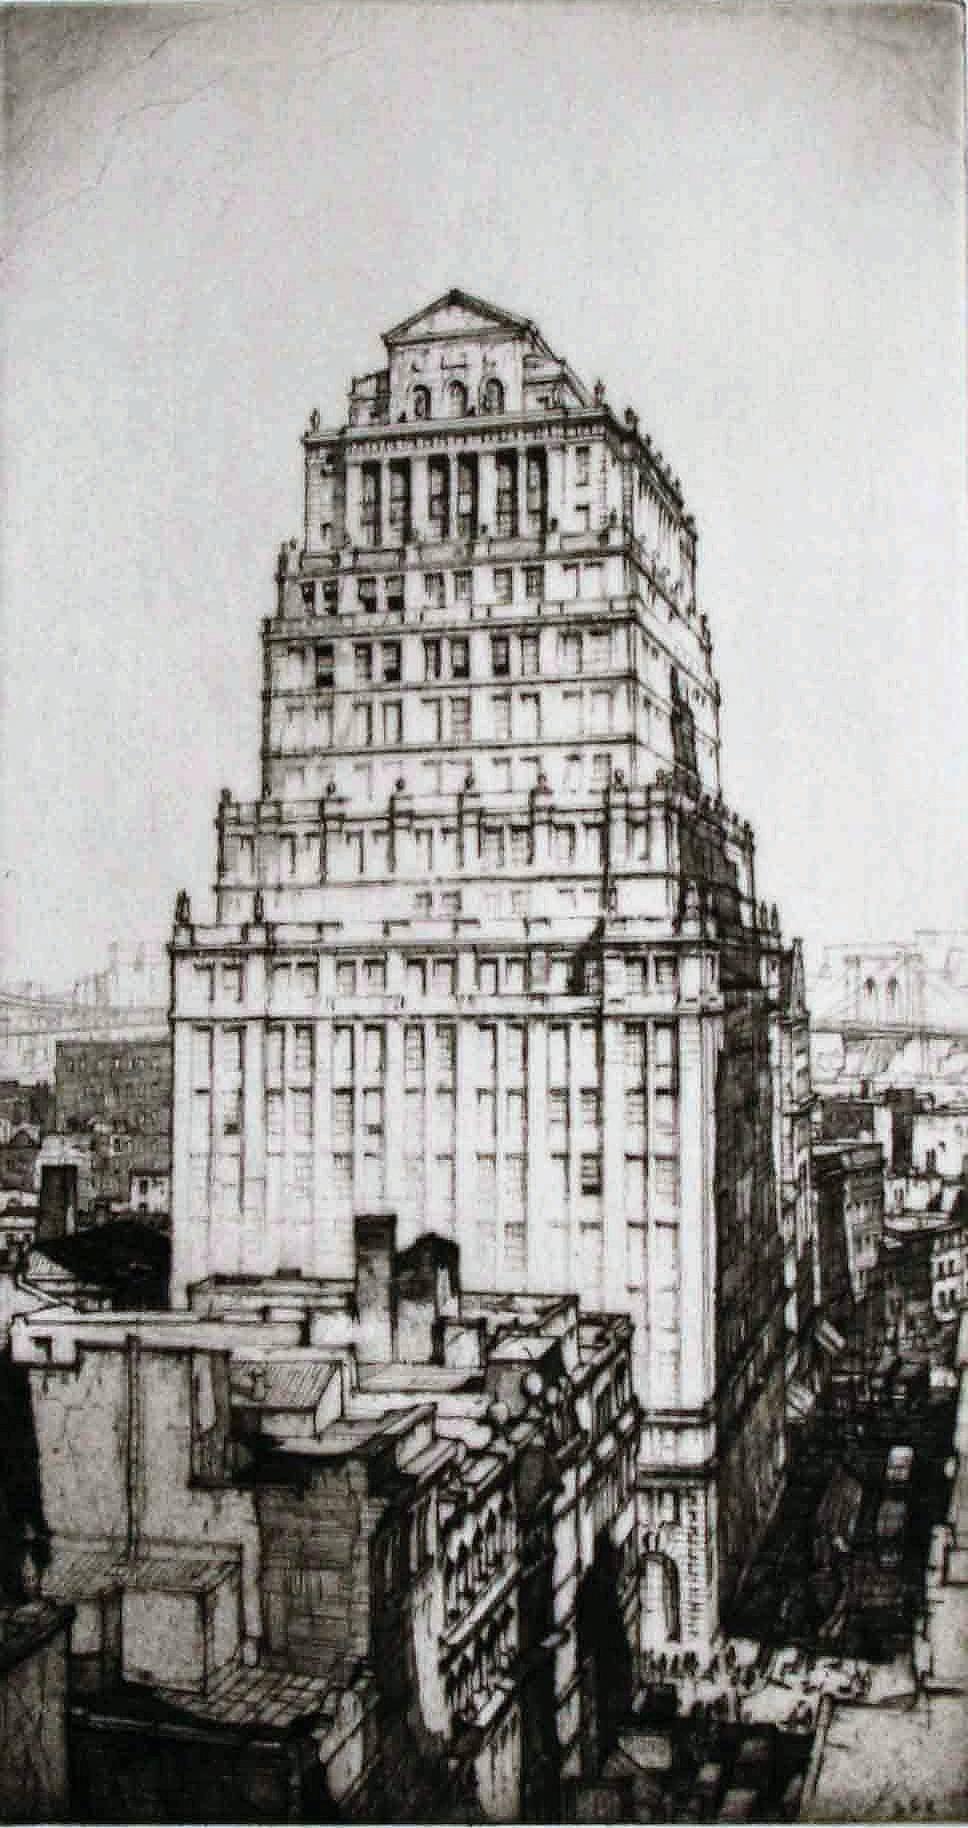 Royal Insurance Building of Canada. (Royal Globe Insurance Company Building)